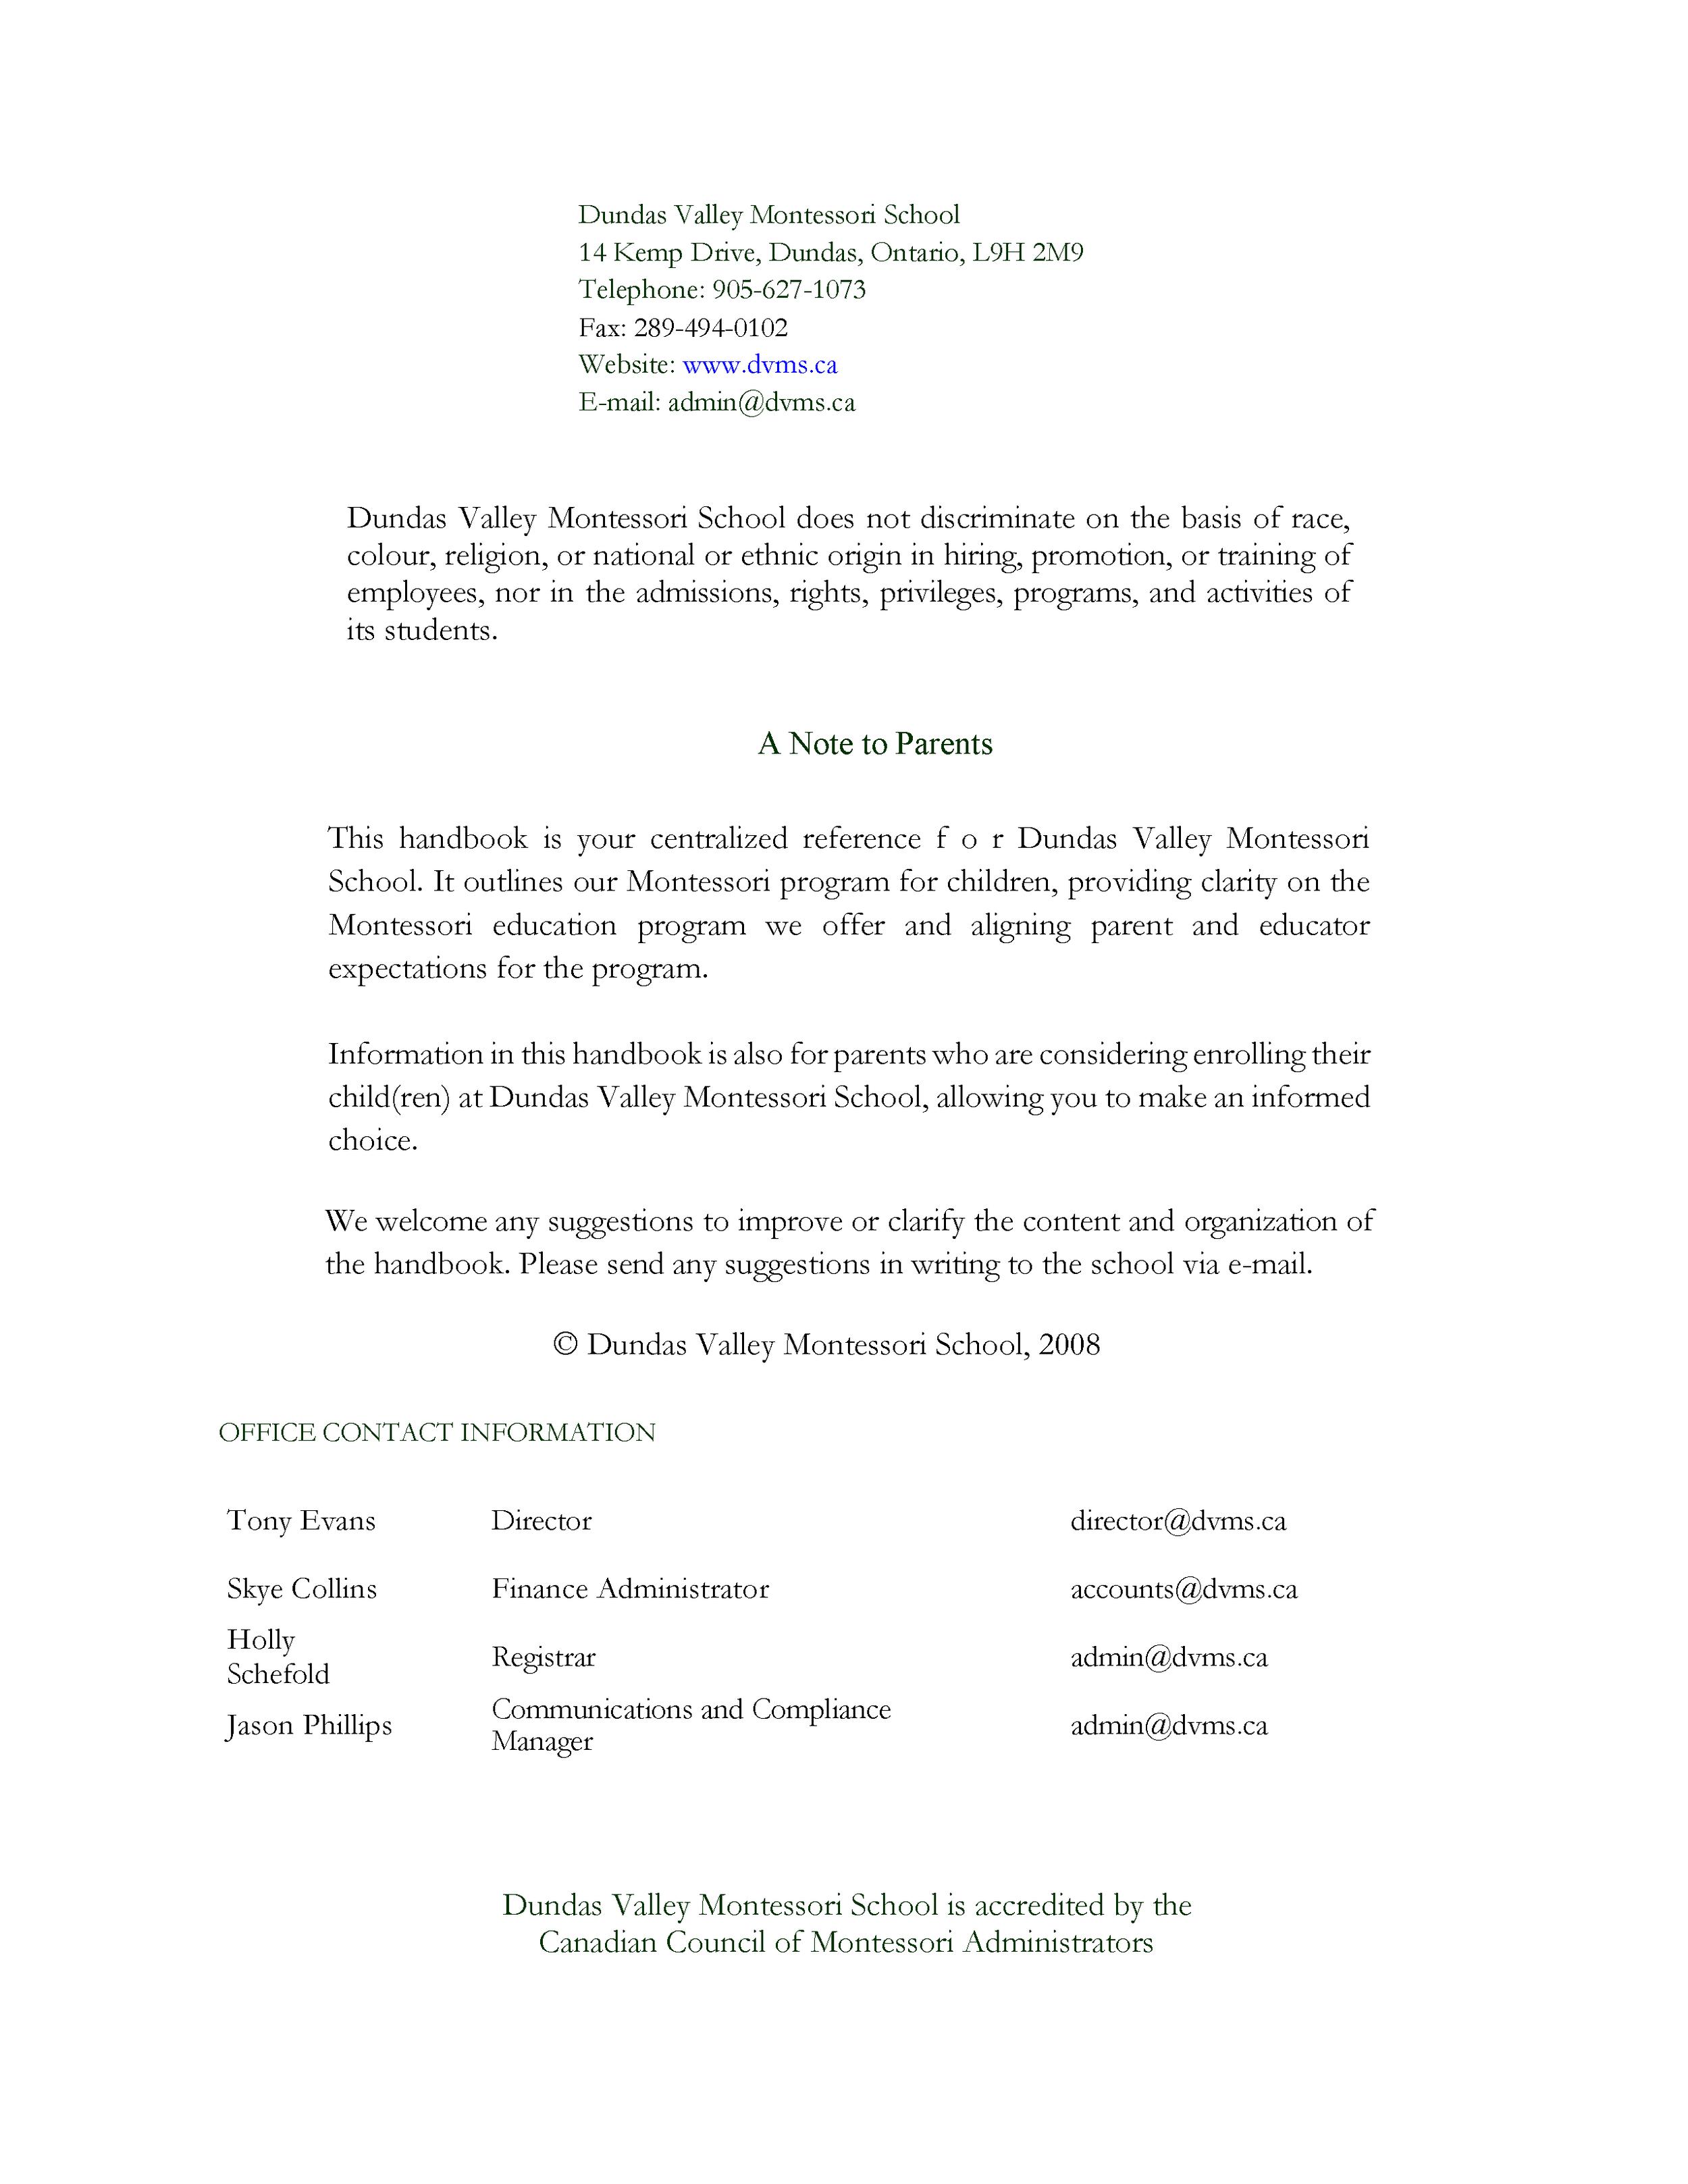 DVMS-Parent-Handbook-19-20_Page_002.png